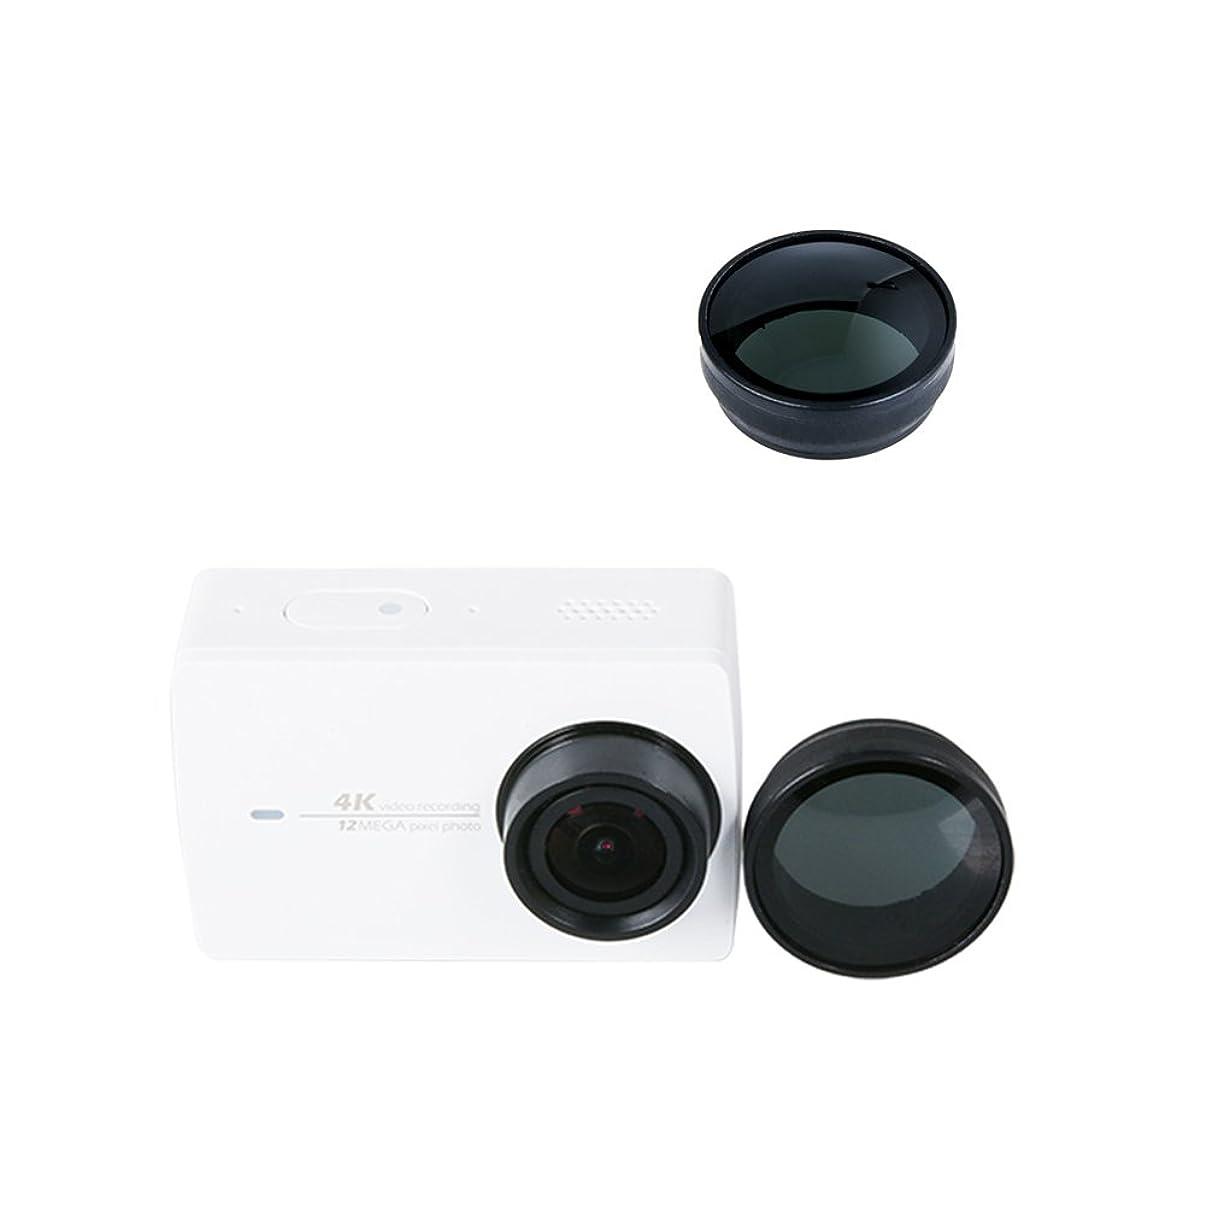 Meijunter Neutral Density ND Filter Lens Protector Cap For Xiaomi Yi 2 4K Action Camera